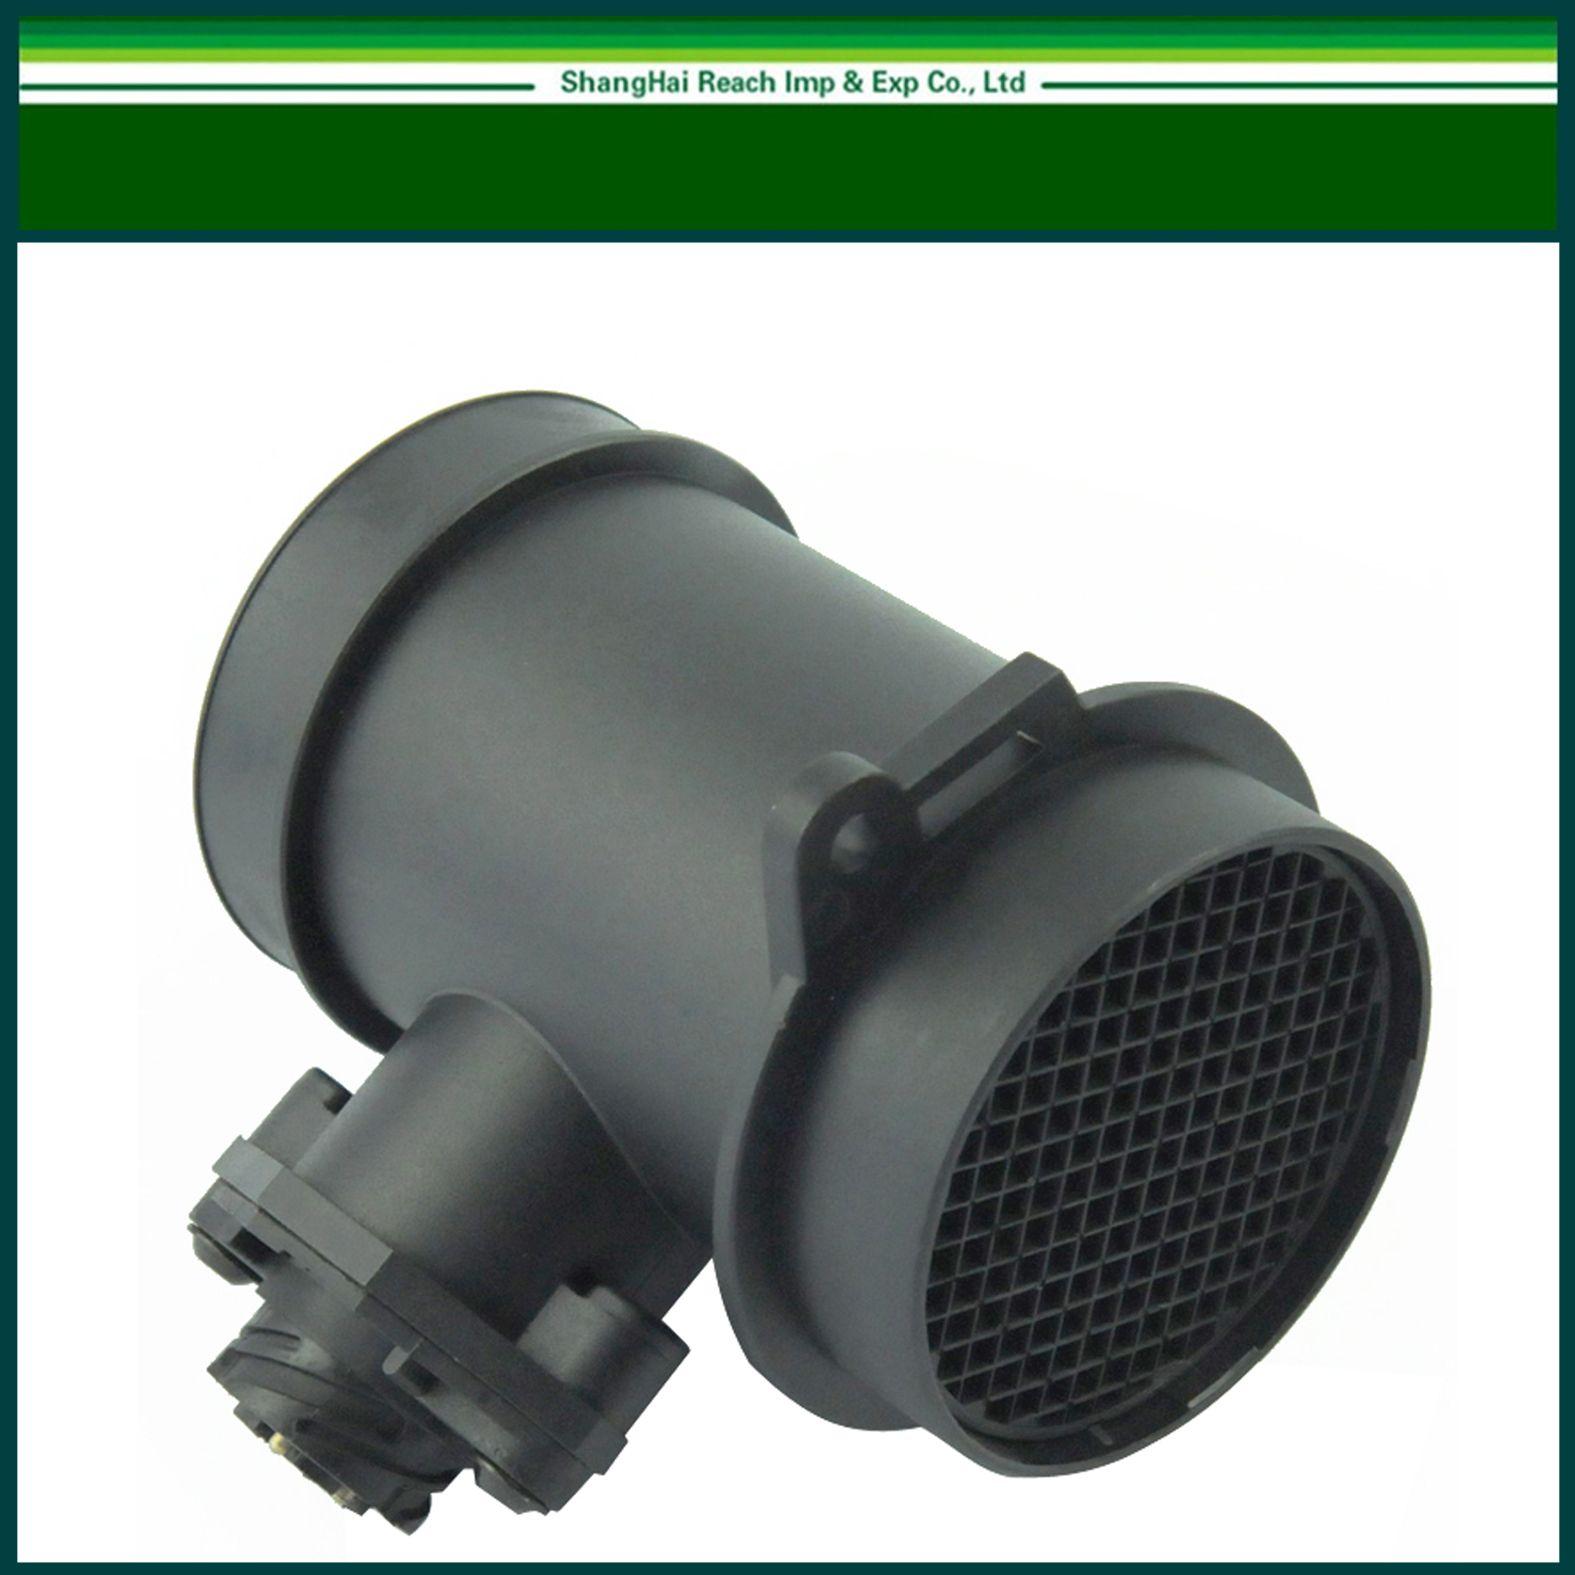 New Mass Air Flow Sensor For MERCEDES BENZS E320 S320 C36 AMG OE# 0280217500